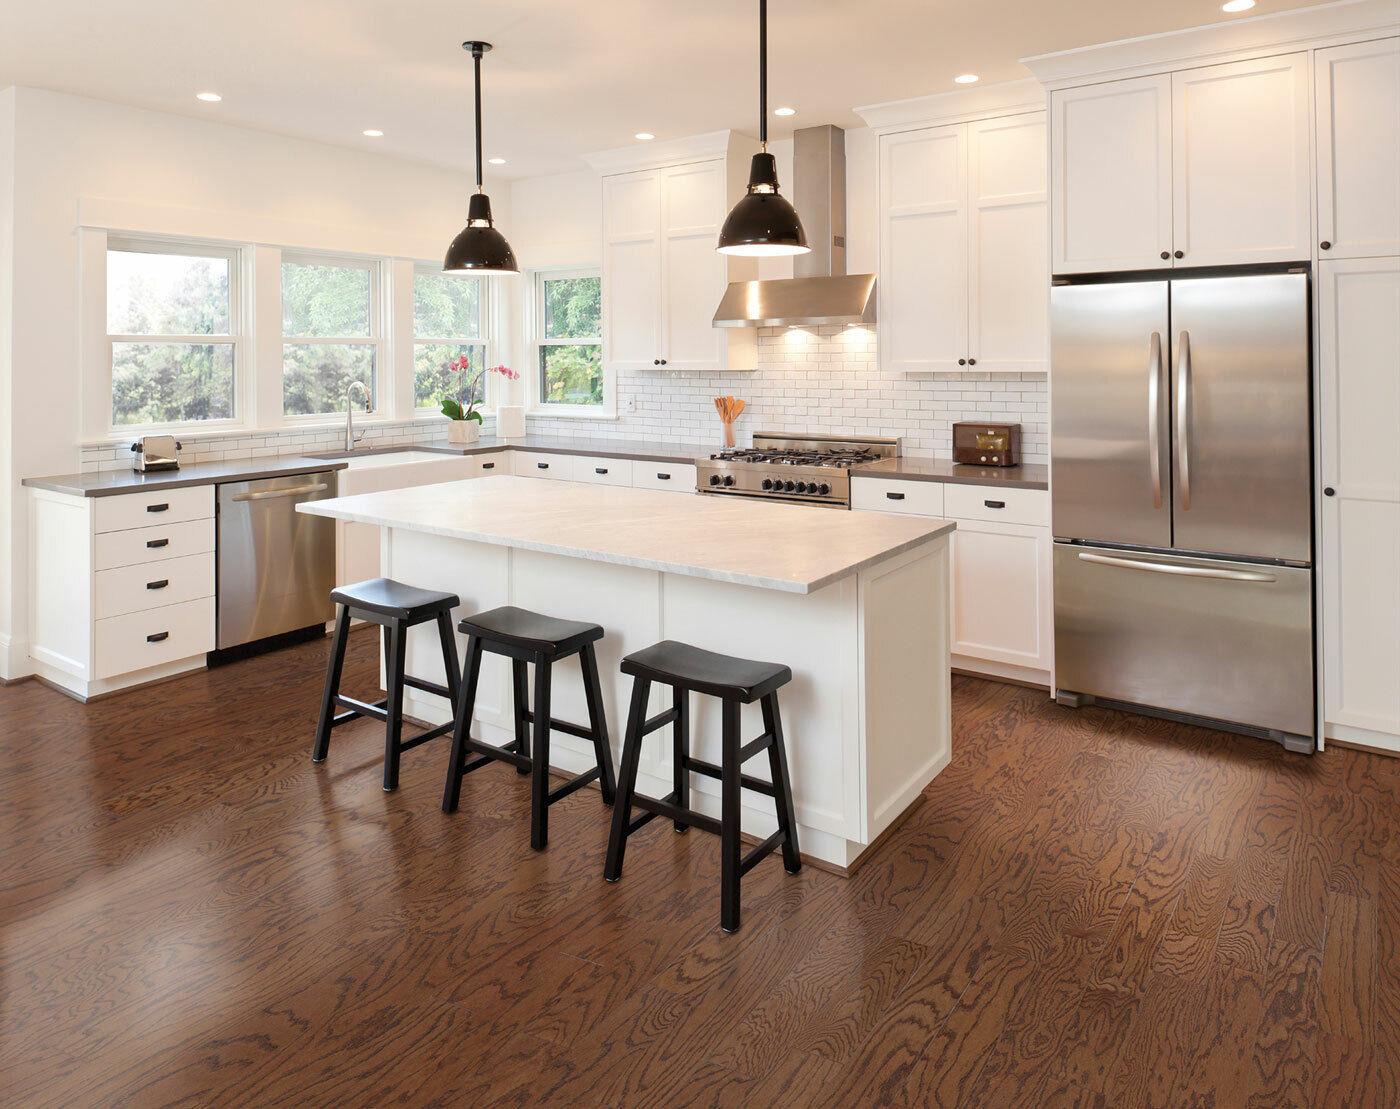 Red Oak Bridle Engineered Hardwood Flooring $1.99/SQFT MADE